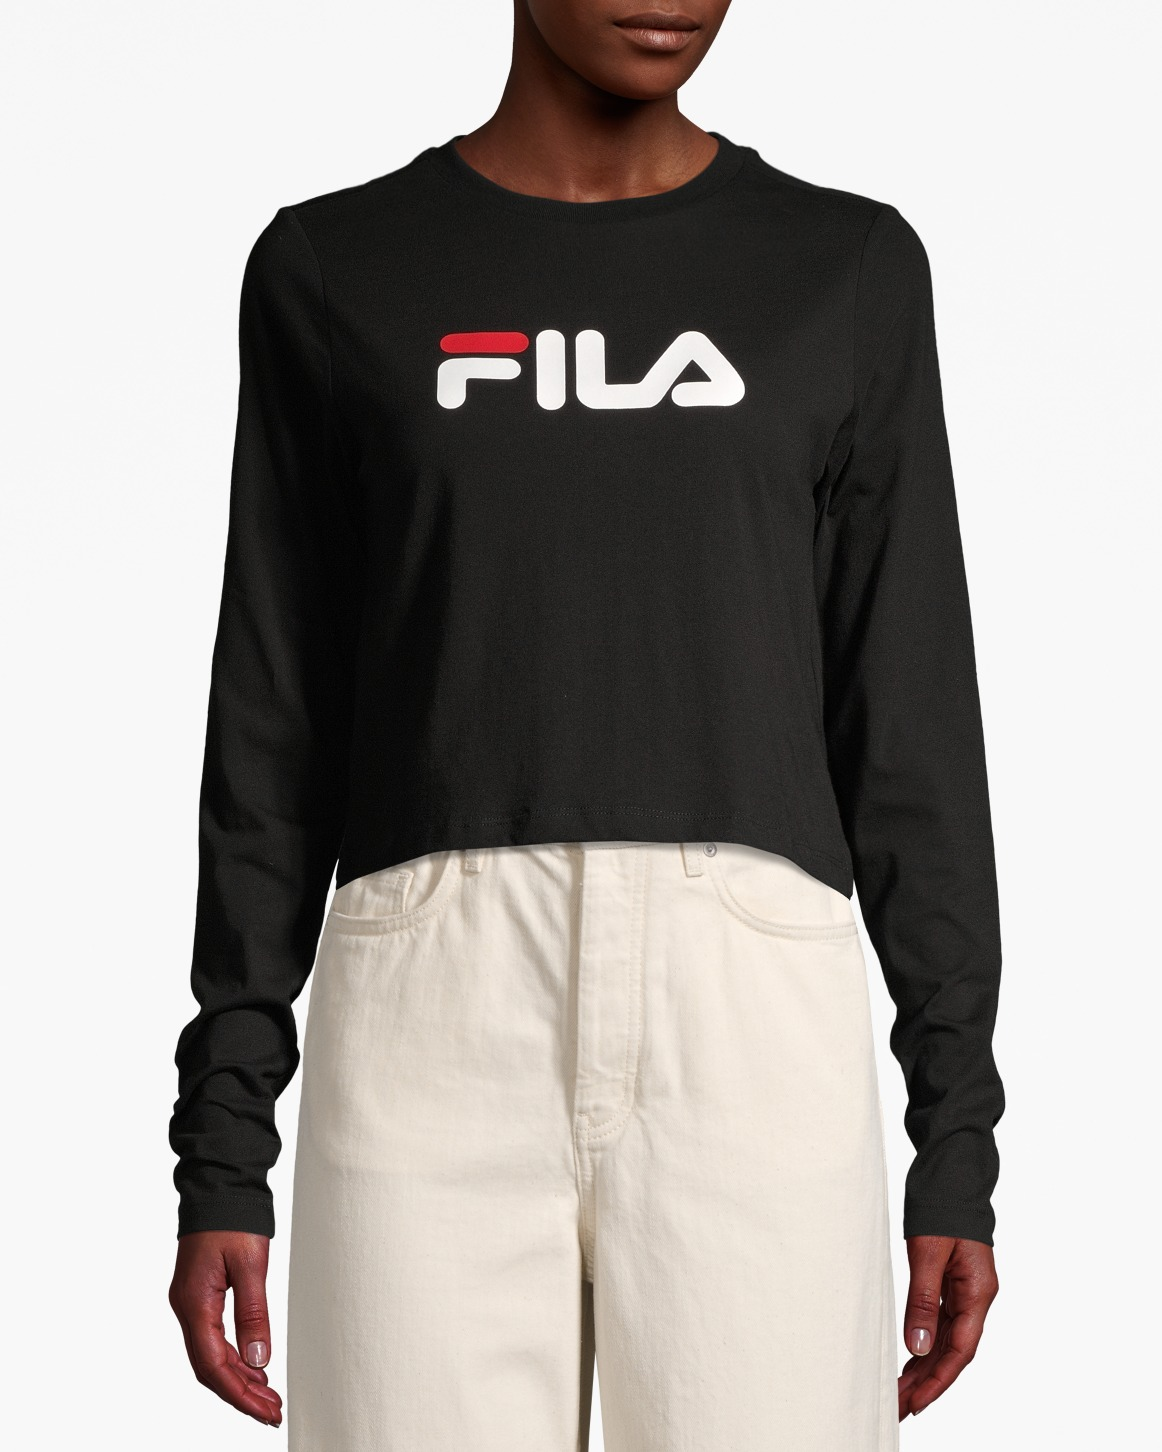 Women Marceline Cropped Ls Shirt Black | Upp till 70